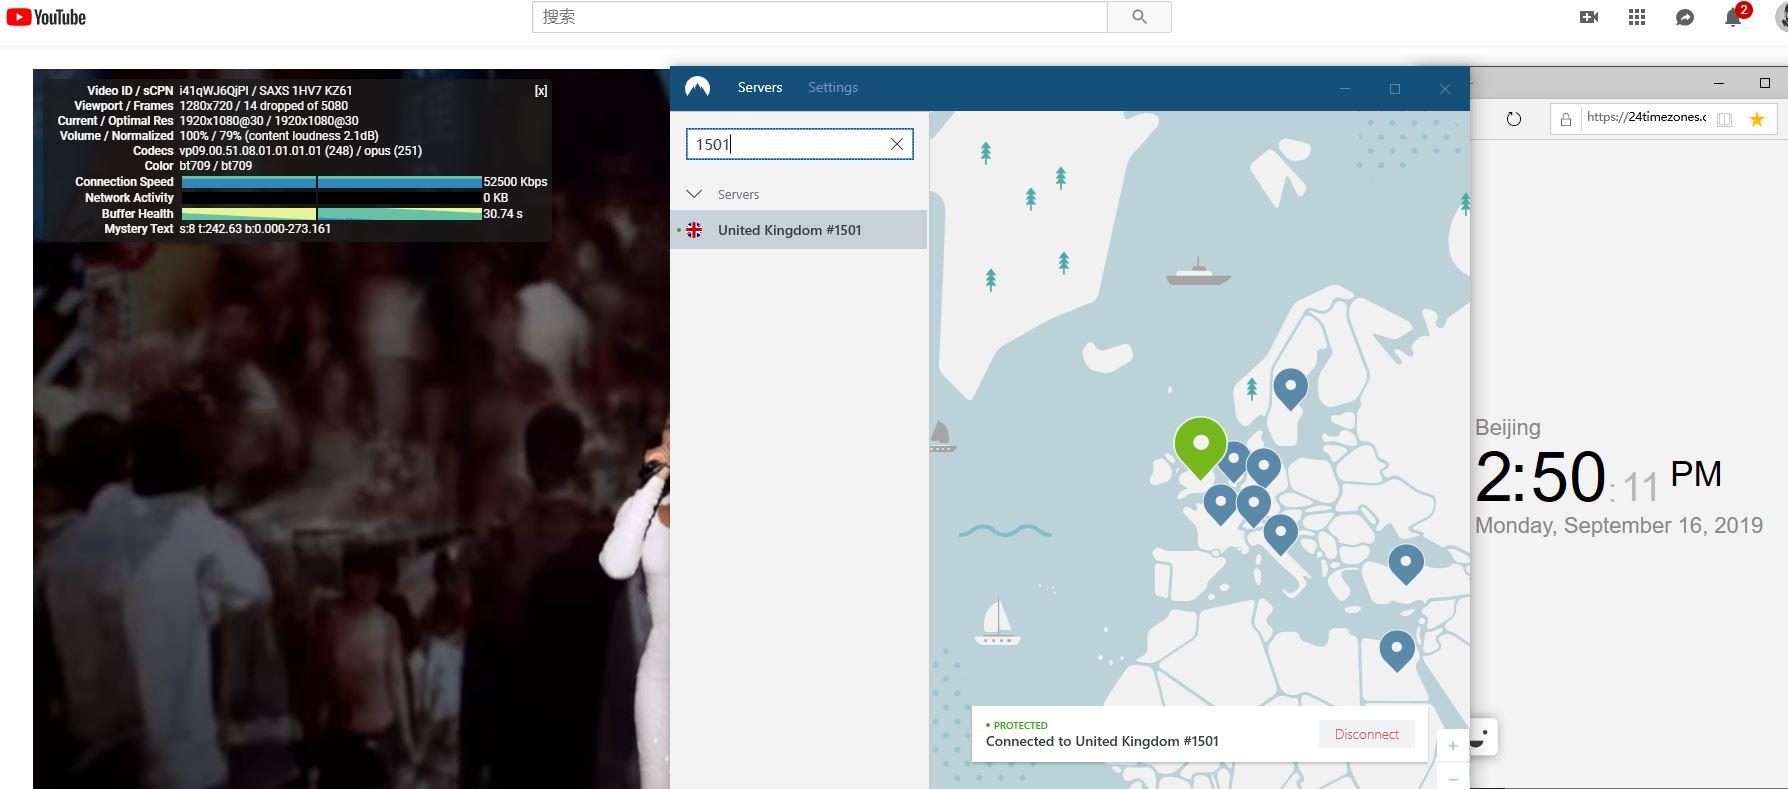 windows NordVPN United Kingdom 1501 服务器 中国翻墙 科学上网 YouTube速度测试-2-20190916